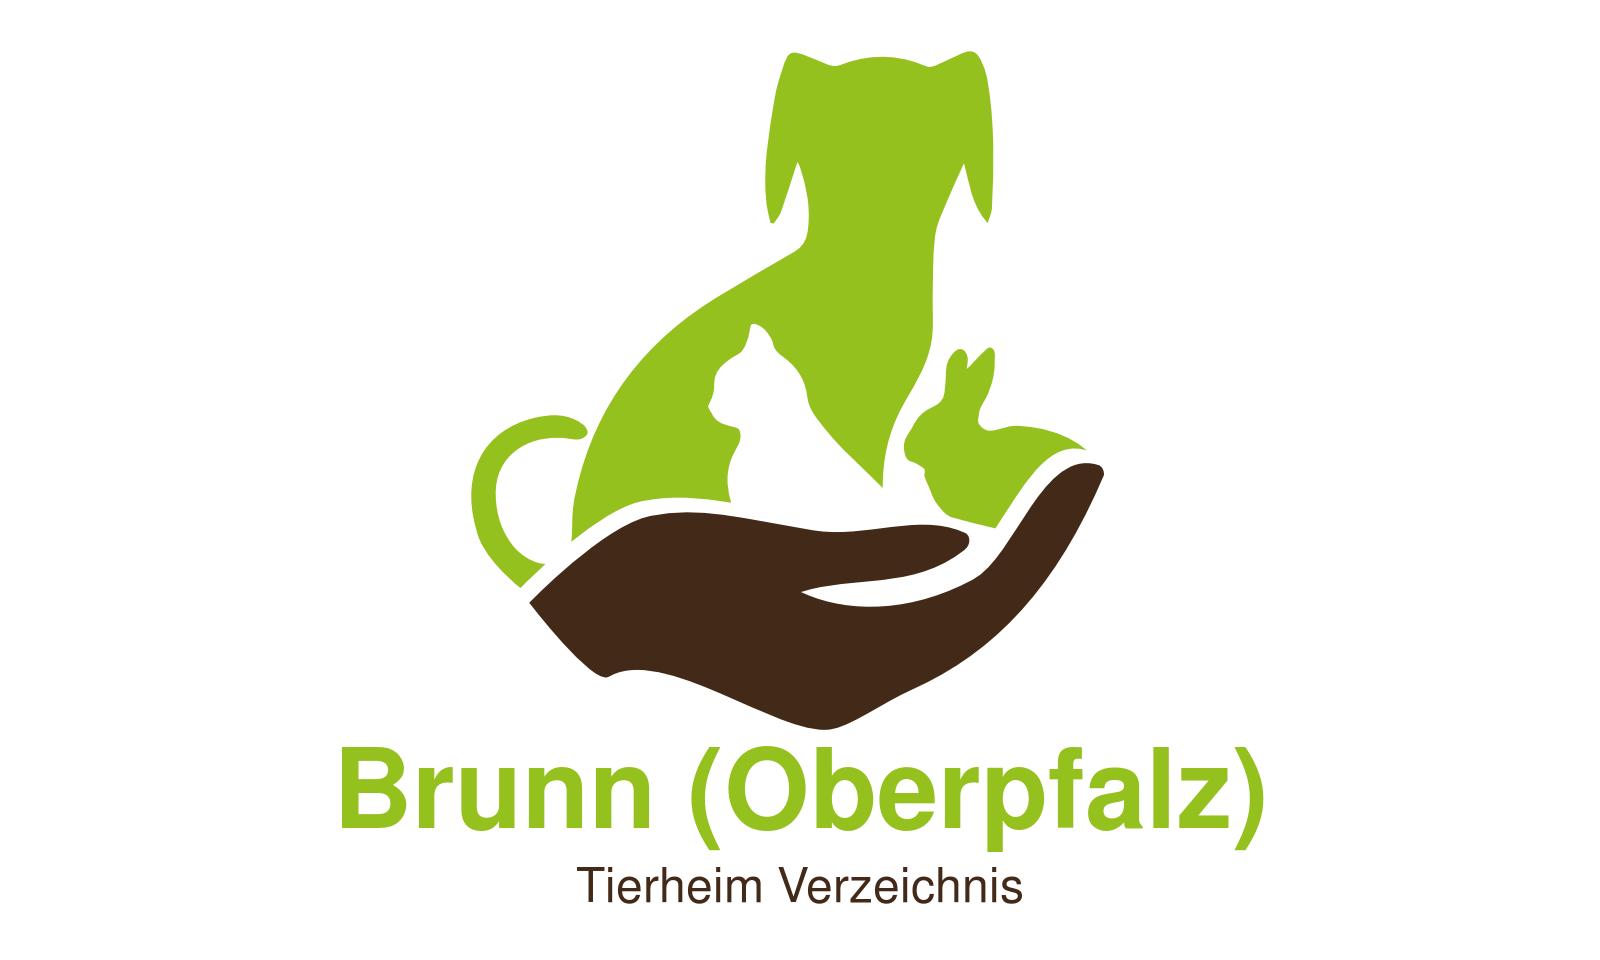 Tierheim Brunn (Oberpfalz)